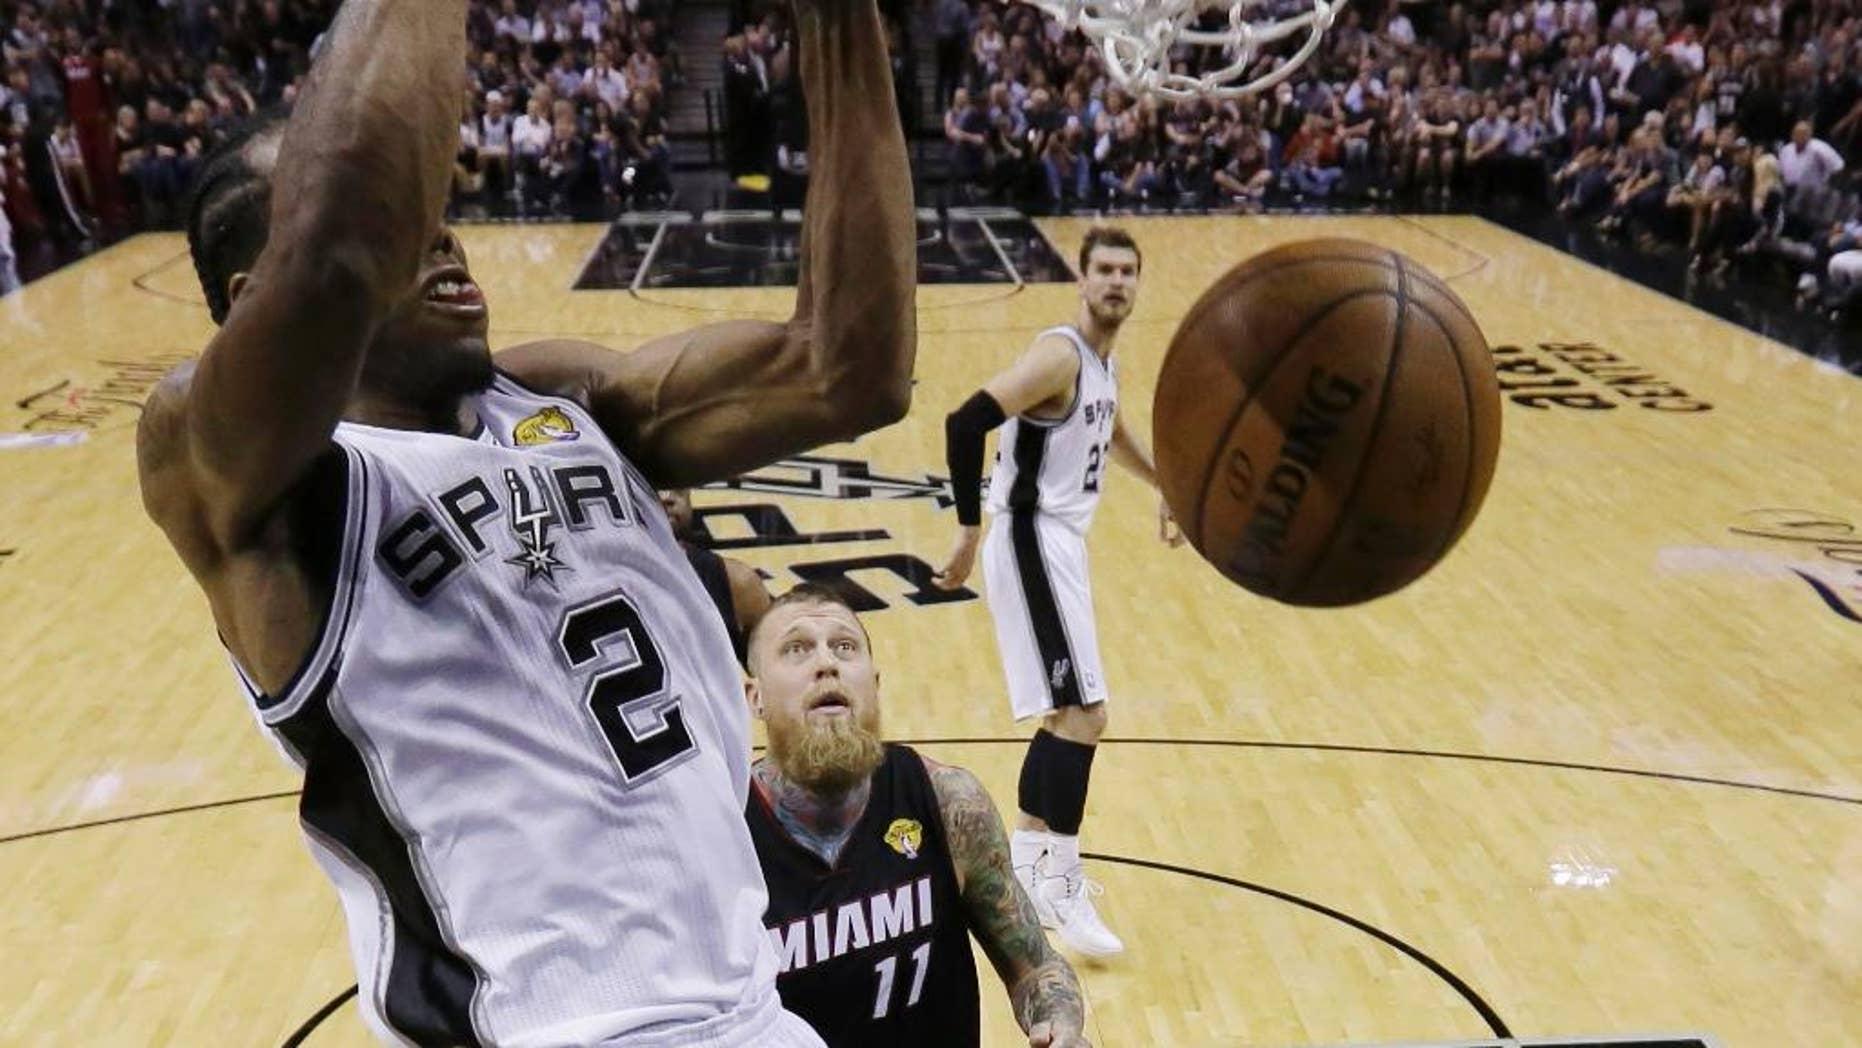 San Antonio Spurs forward Kawhi Leonard (2) dunks against the Miami Heat during the first half in Game 5 of the NBA basketball finals on Sunday, June 15, 2014, in San Antonio. (AP Photo/David J. Phillip, pool)